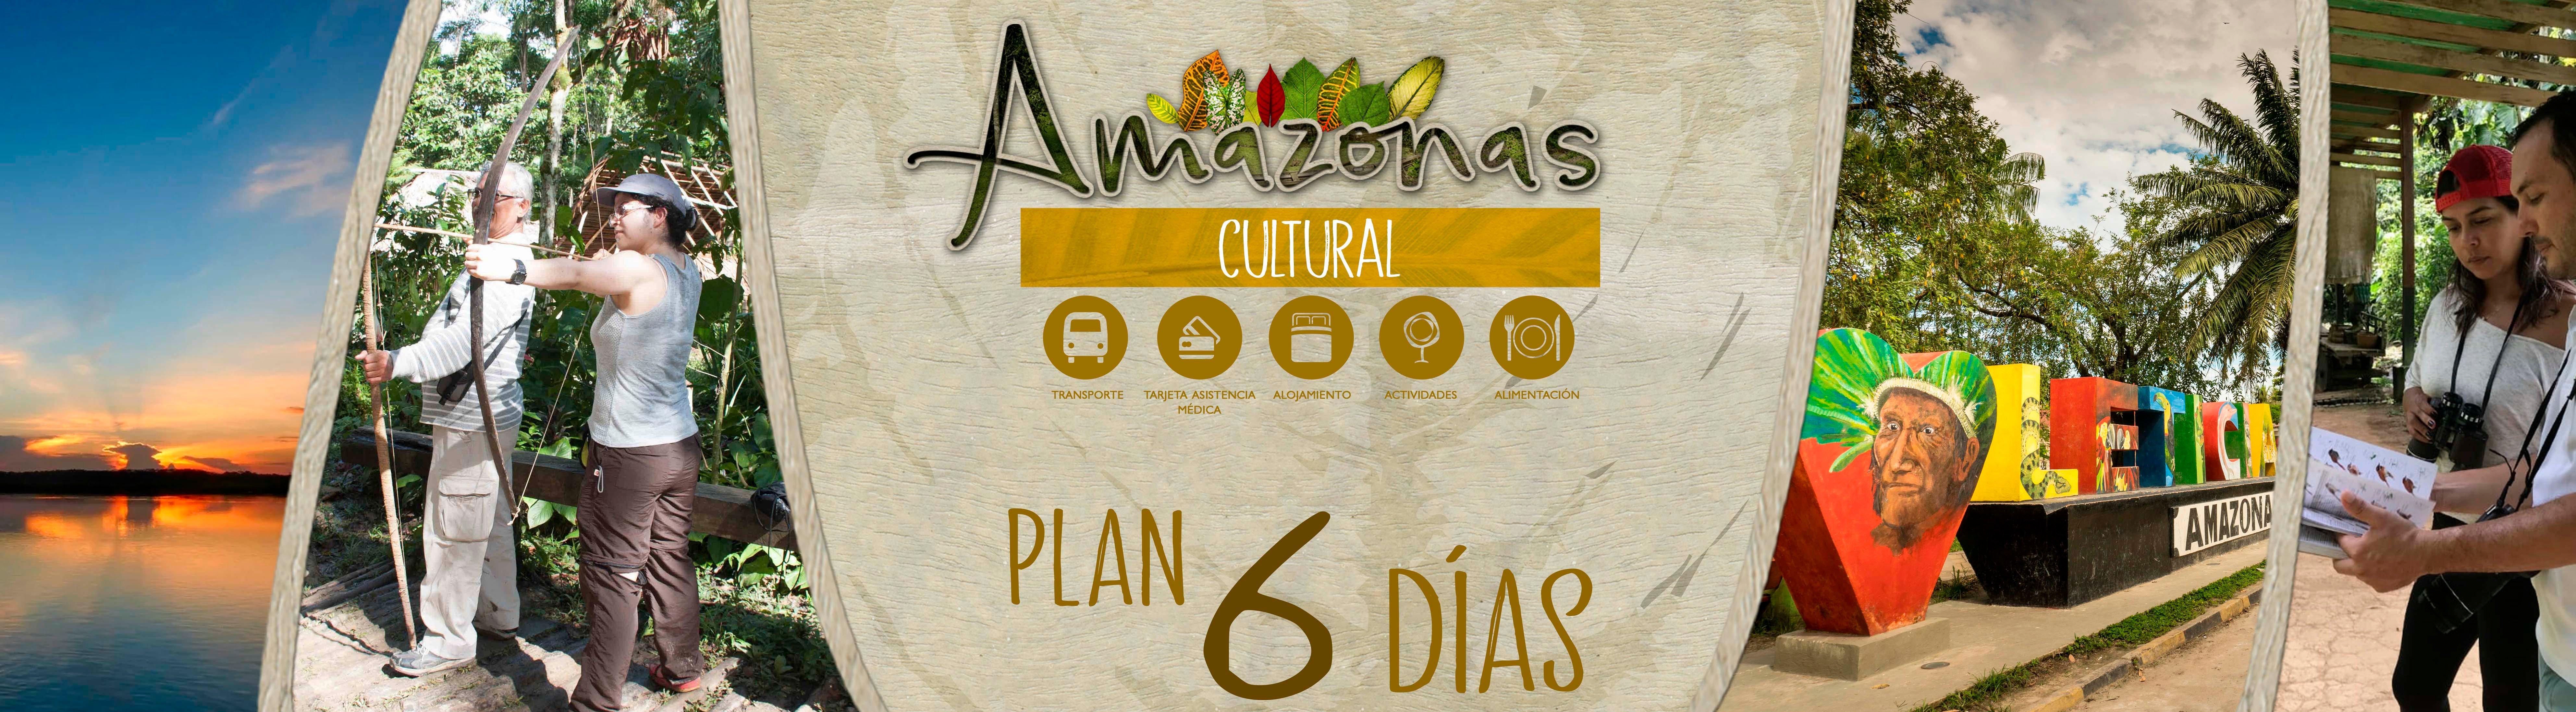 cultural 6 DIAS